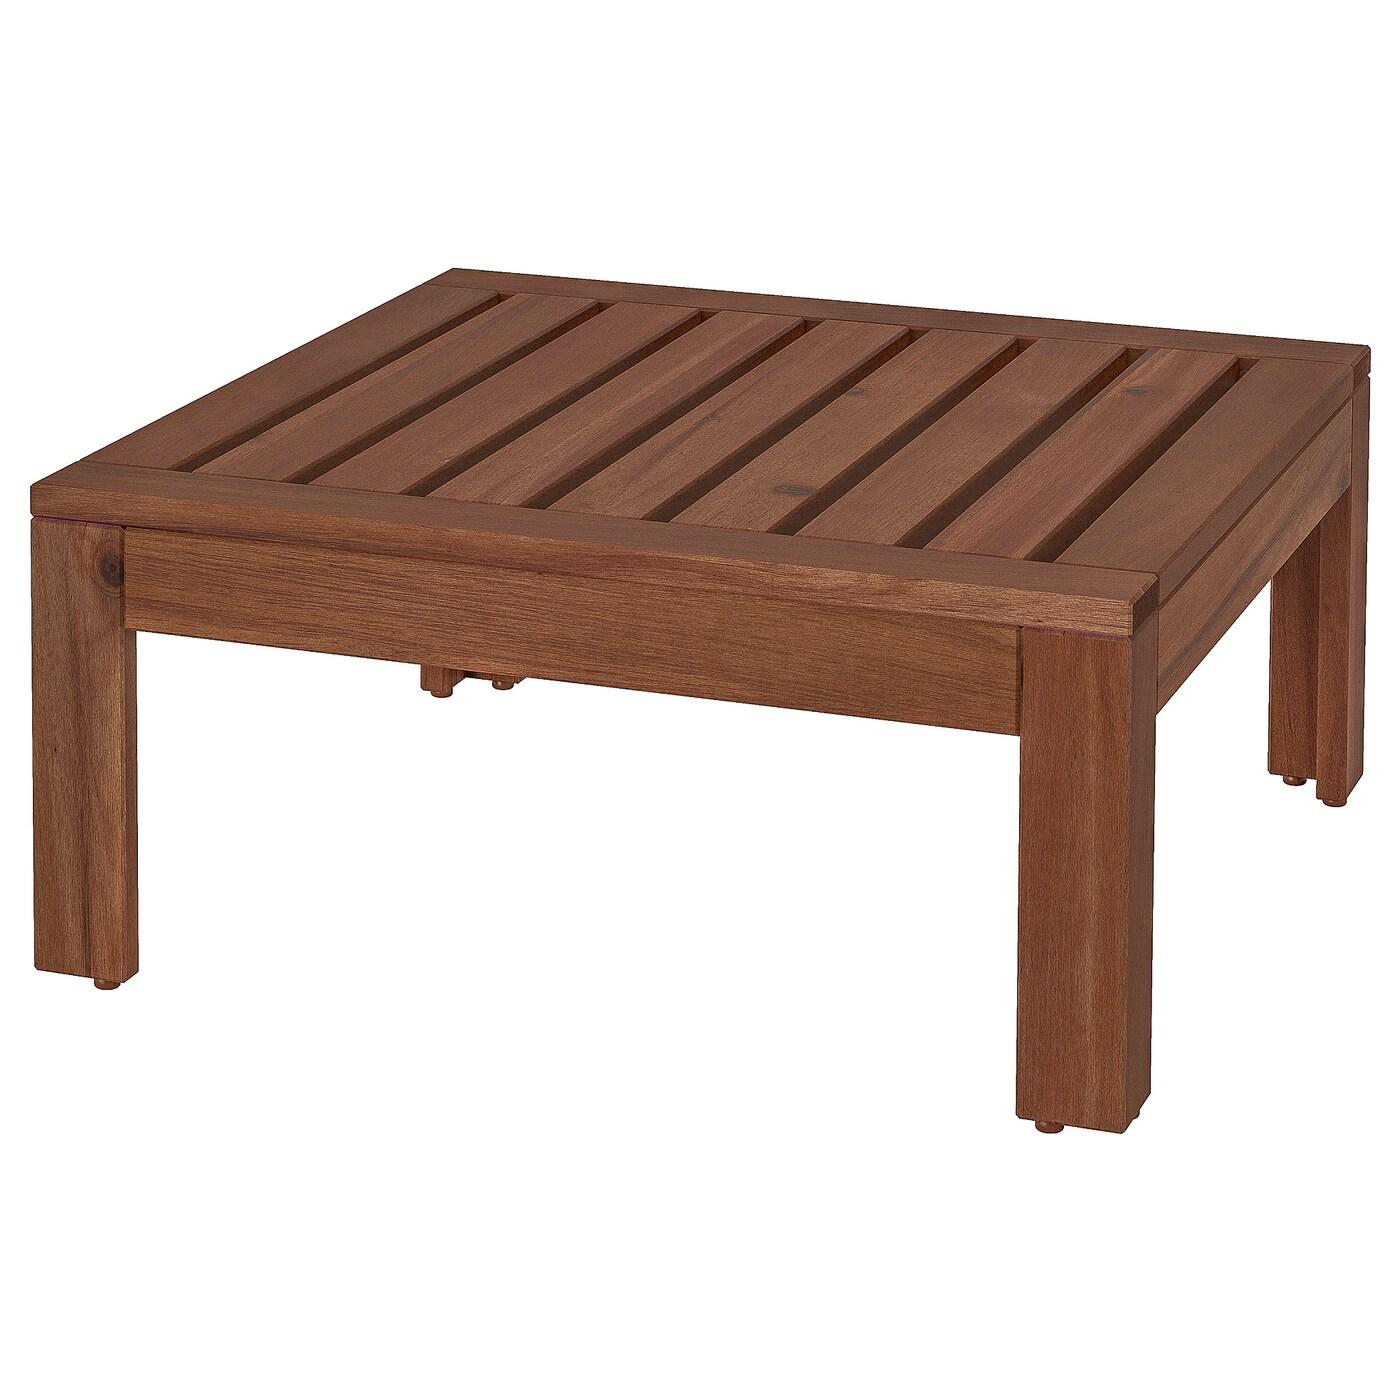 ÄPPLARÖ brown stained, Table/stool section, outdoor - IKEA